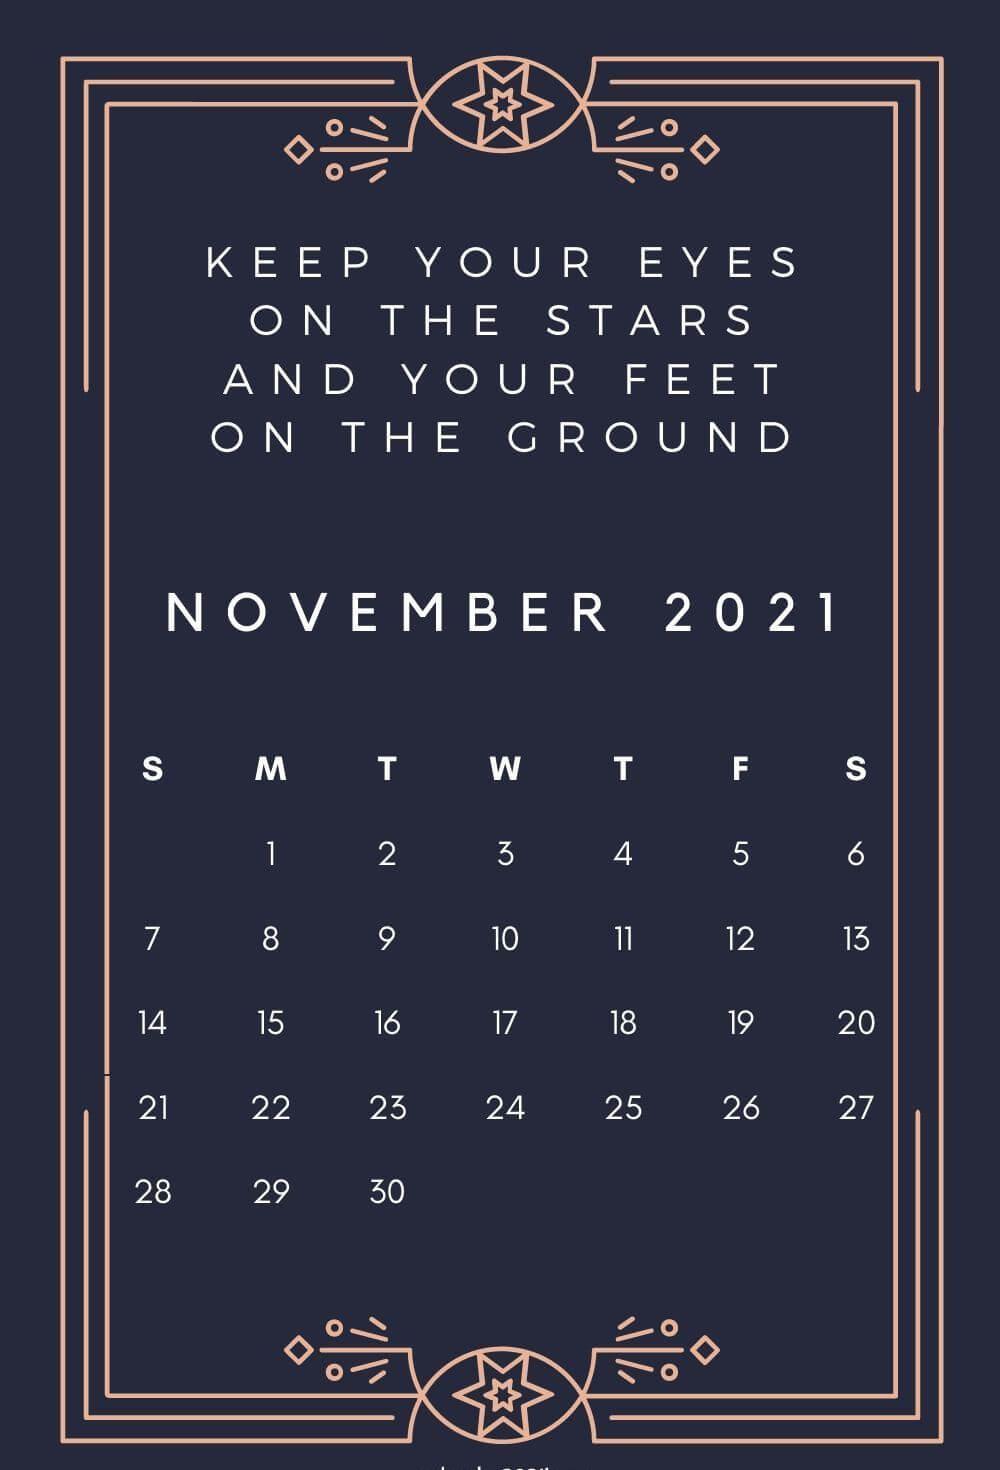 Inspiring November 2021 Calendar